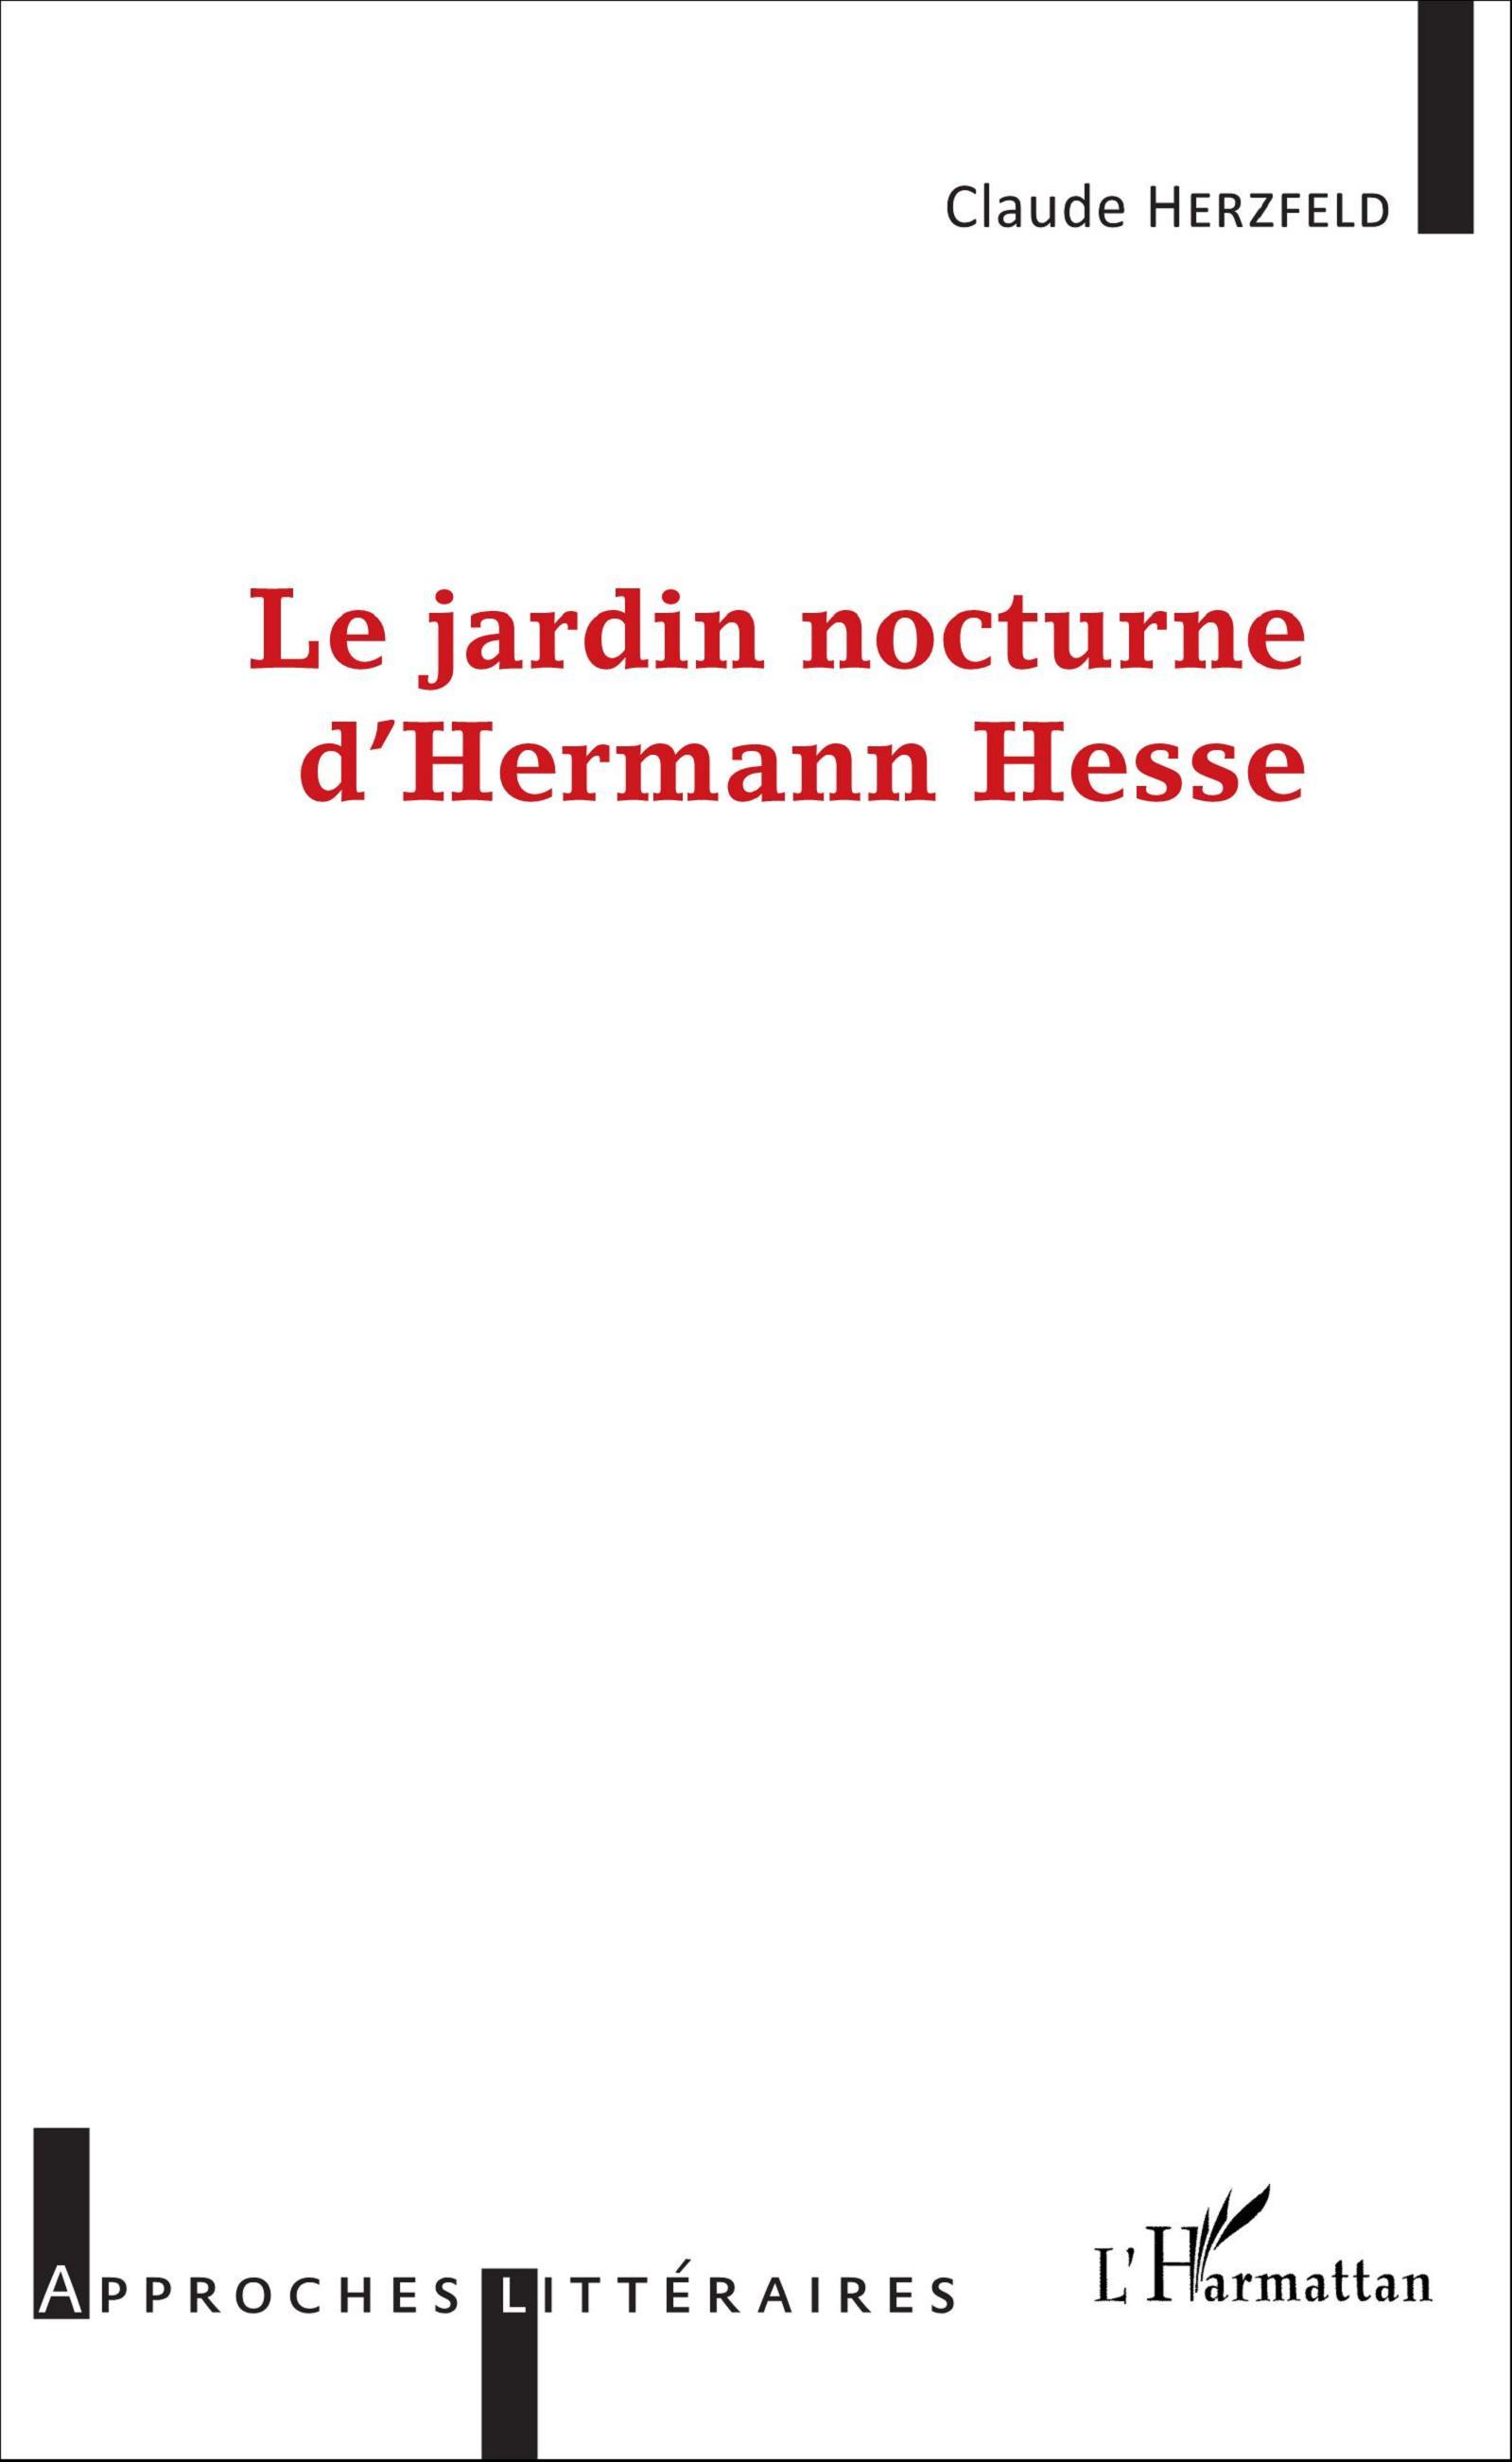 Cl. Herzfeld, Le Jardin nocturne d'Hermann Hesse